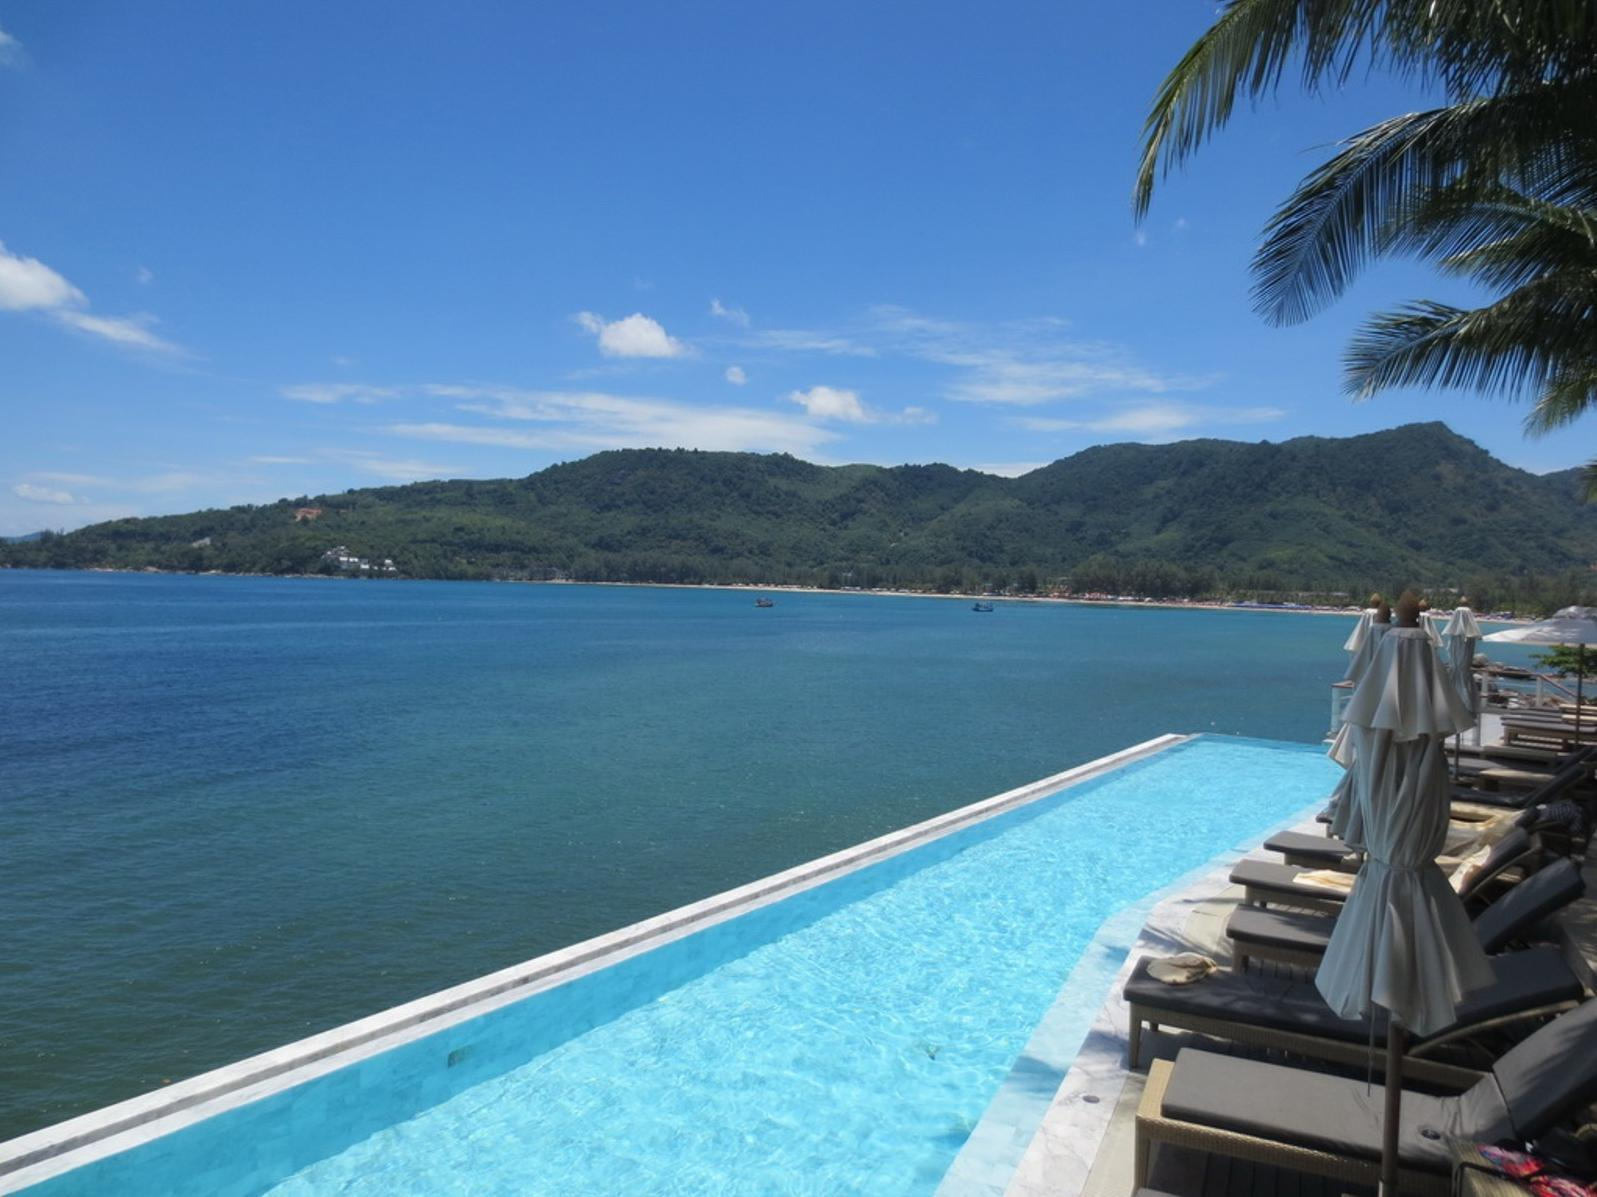 Cape Sienna Phuket Hotel and Villas13